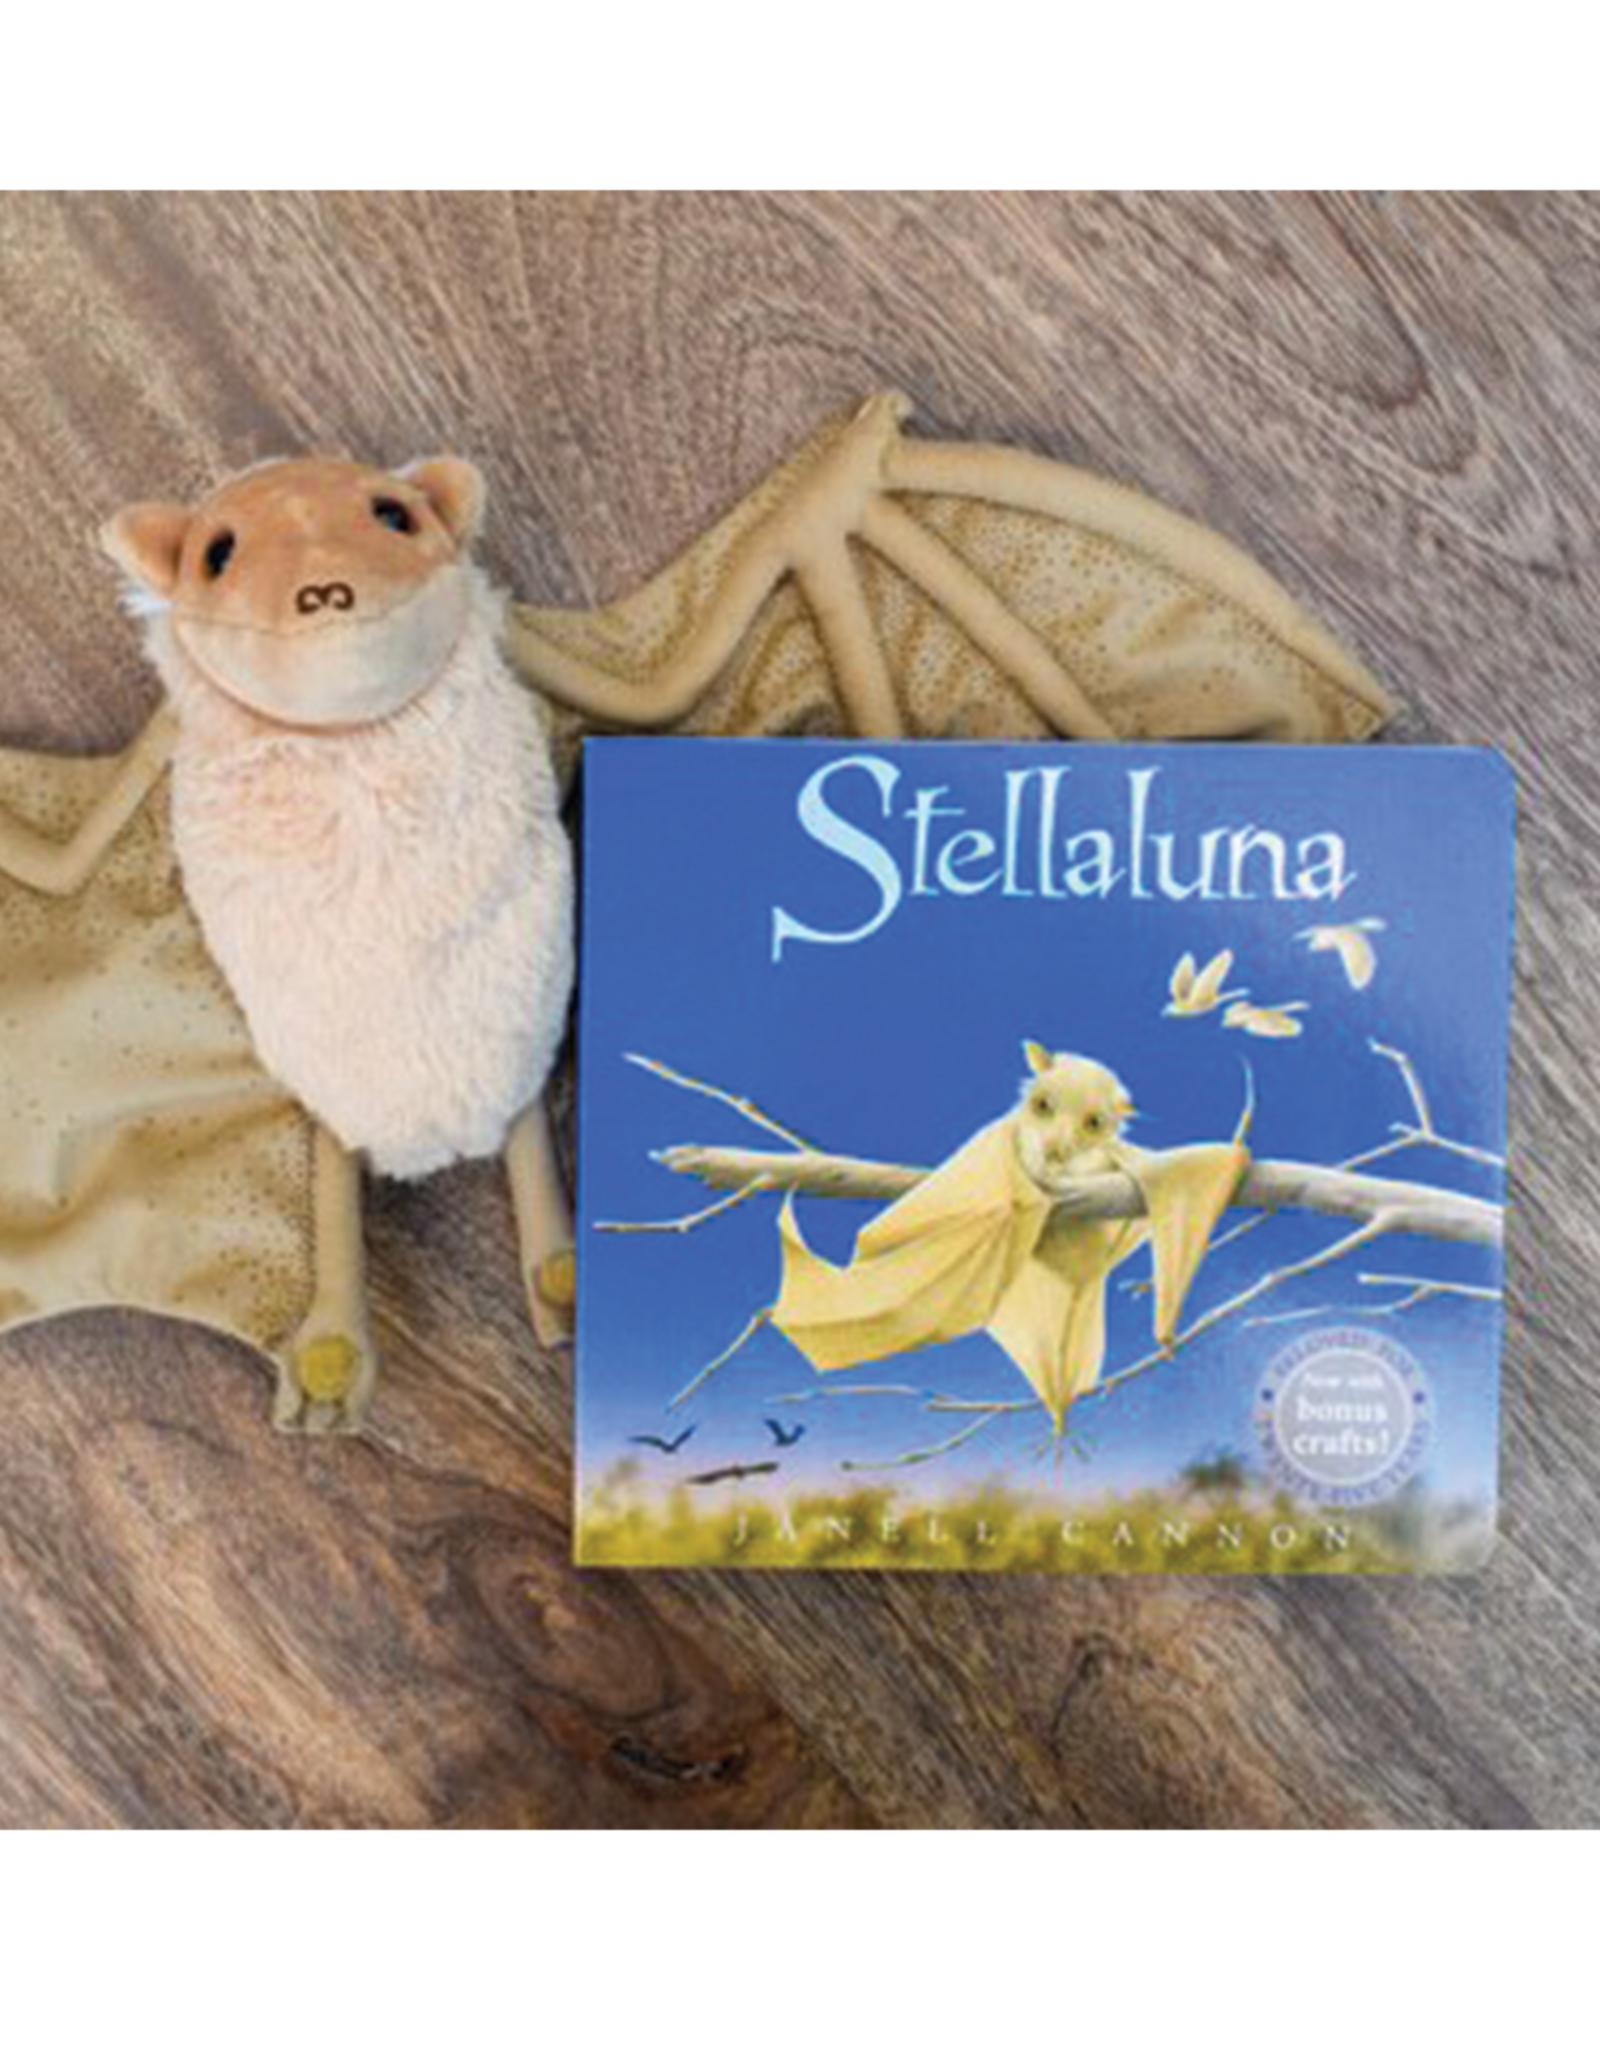 Stellaluna Plush Doll